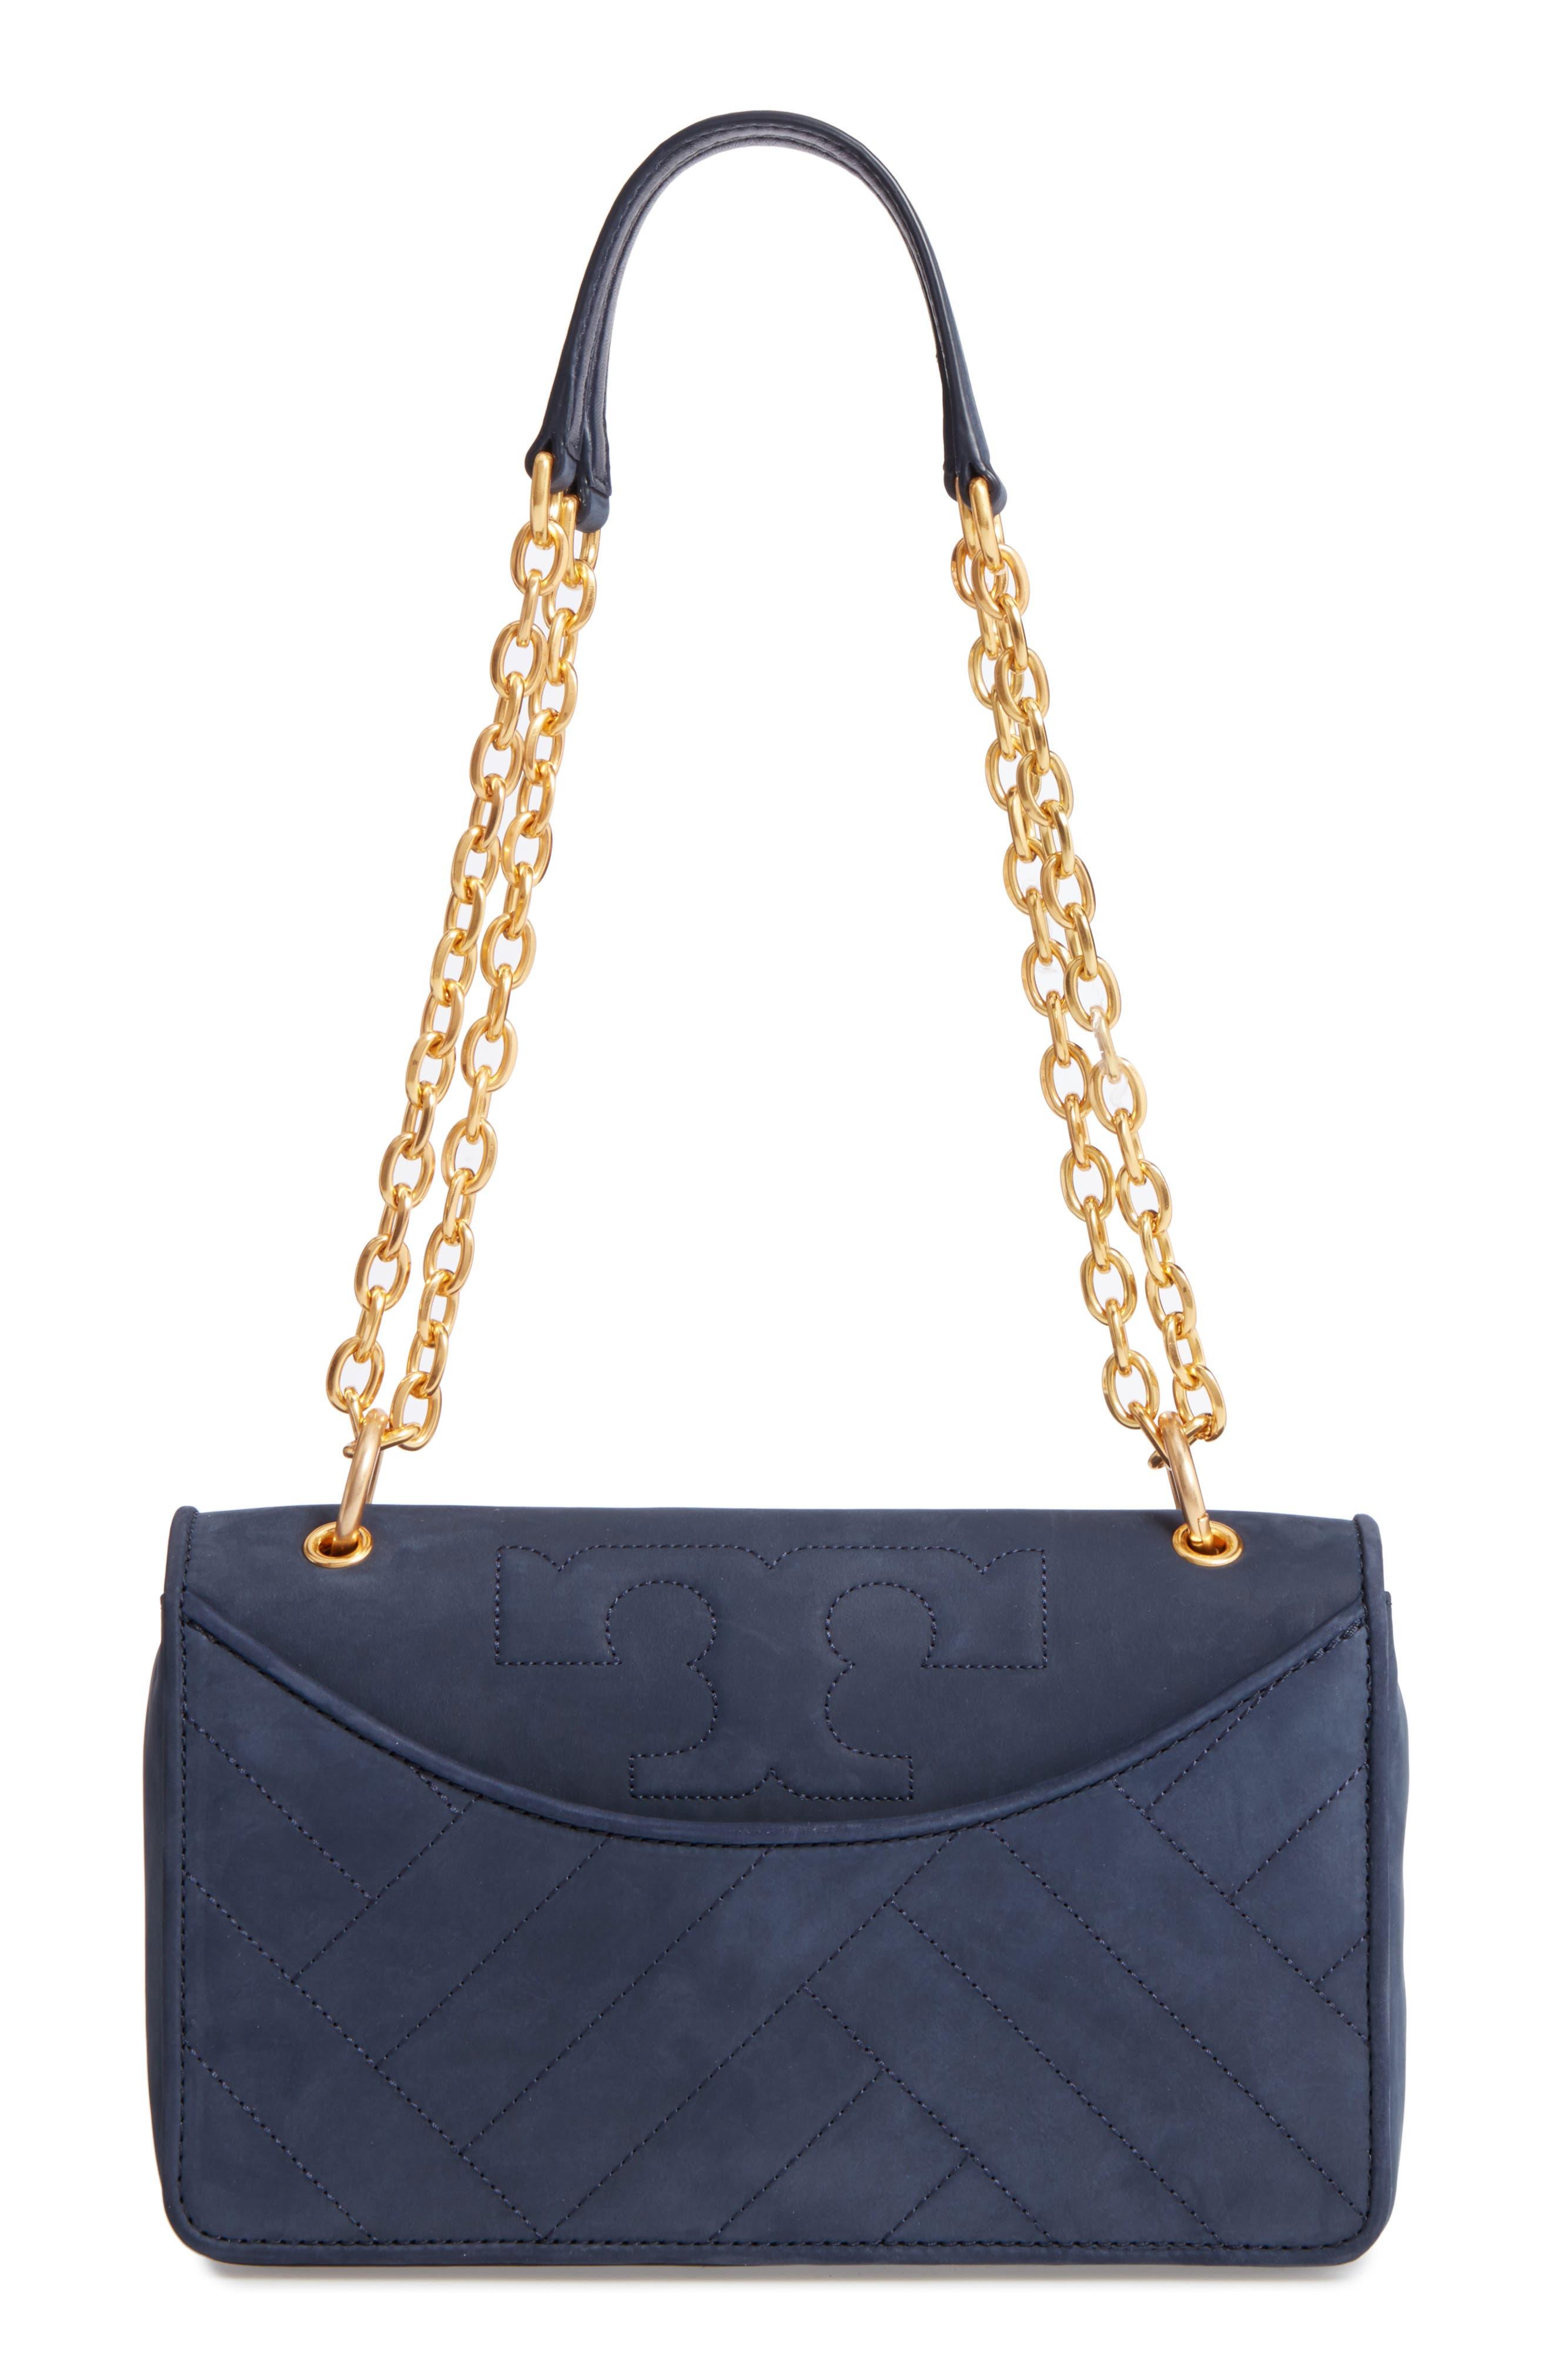 Main Image - Tory Burch Alexa Leather Shoulder Bag